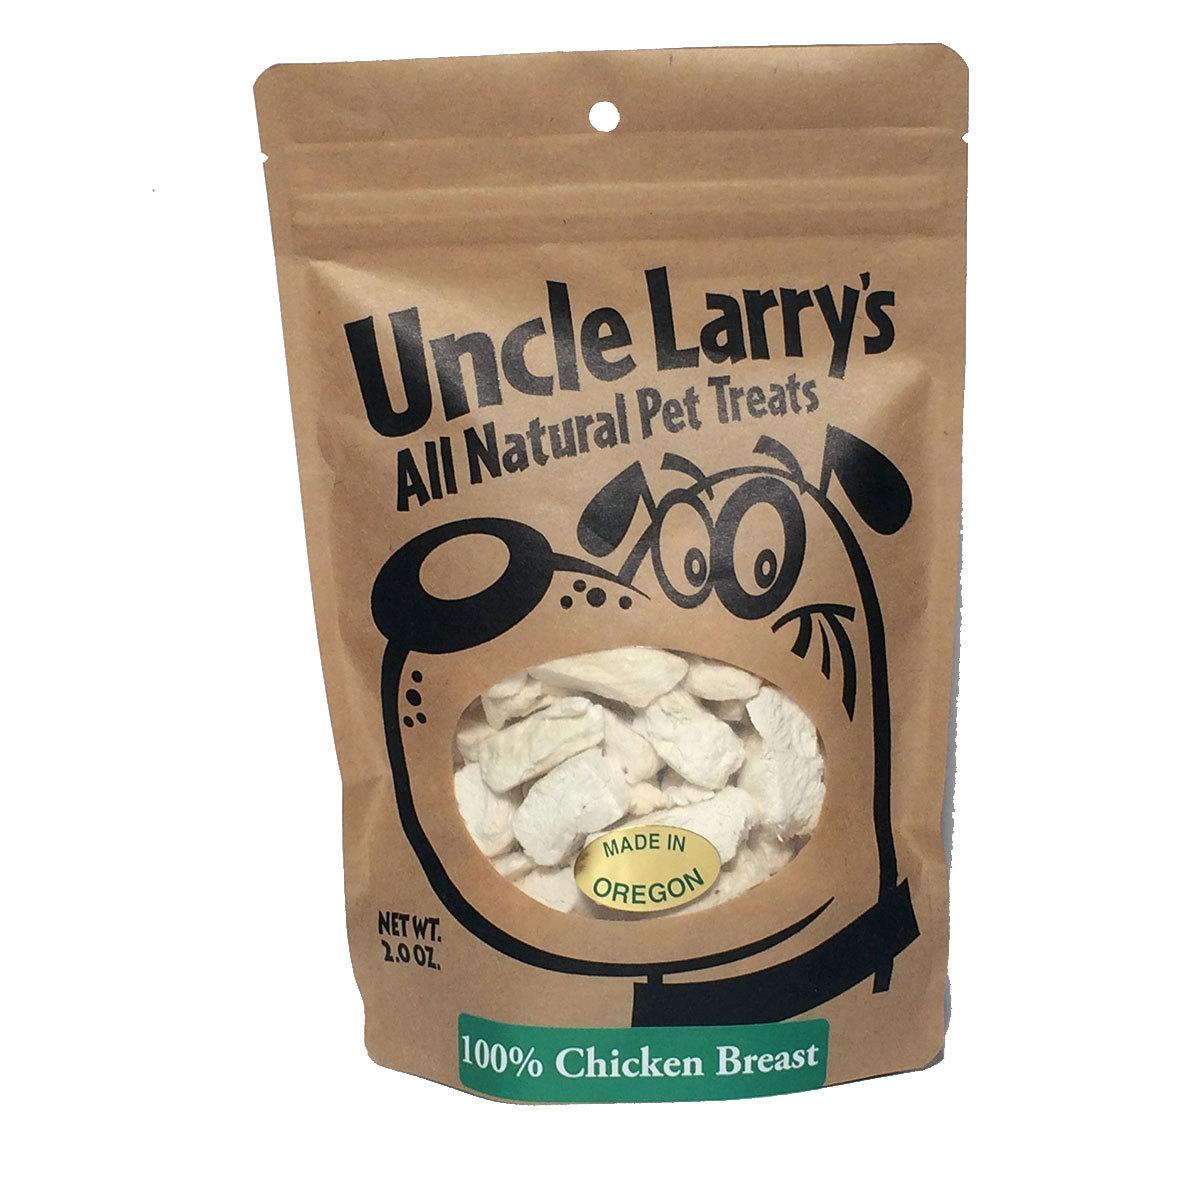 Chicken Breast Freeze-Dried Grain-Free Cat Treats